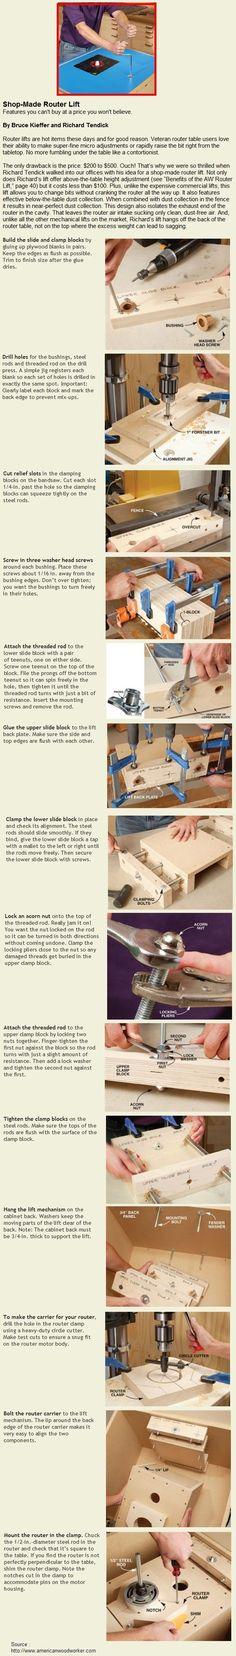 Shop-Made Router Lift | WoodworkerZ.com